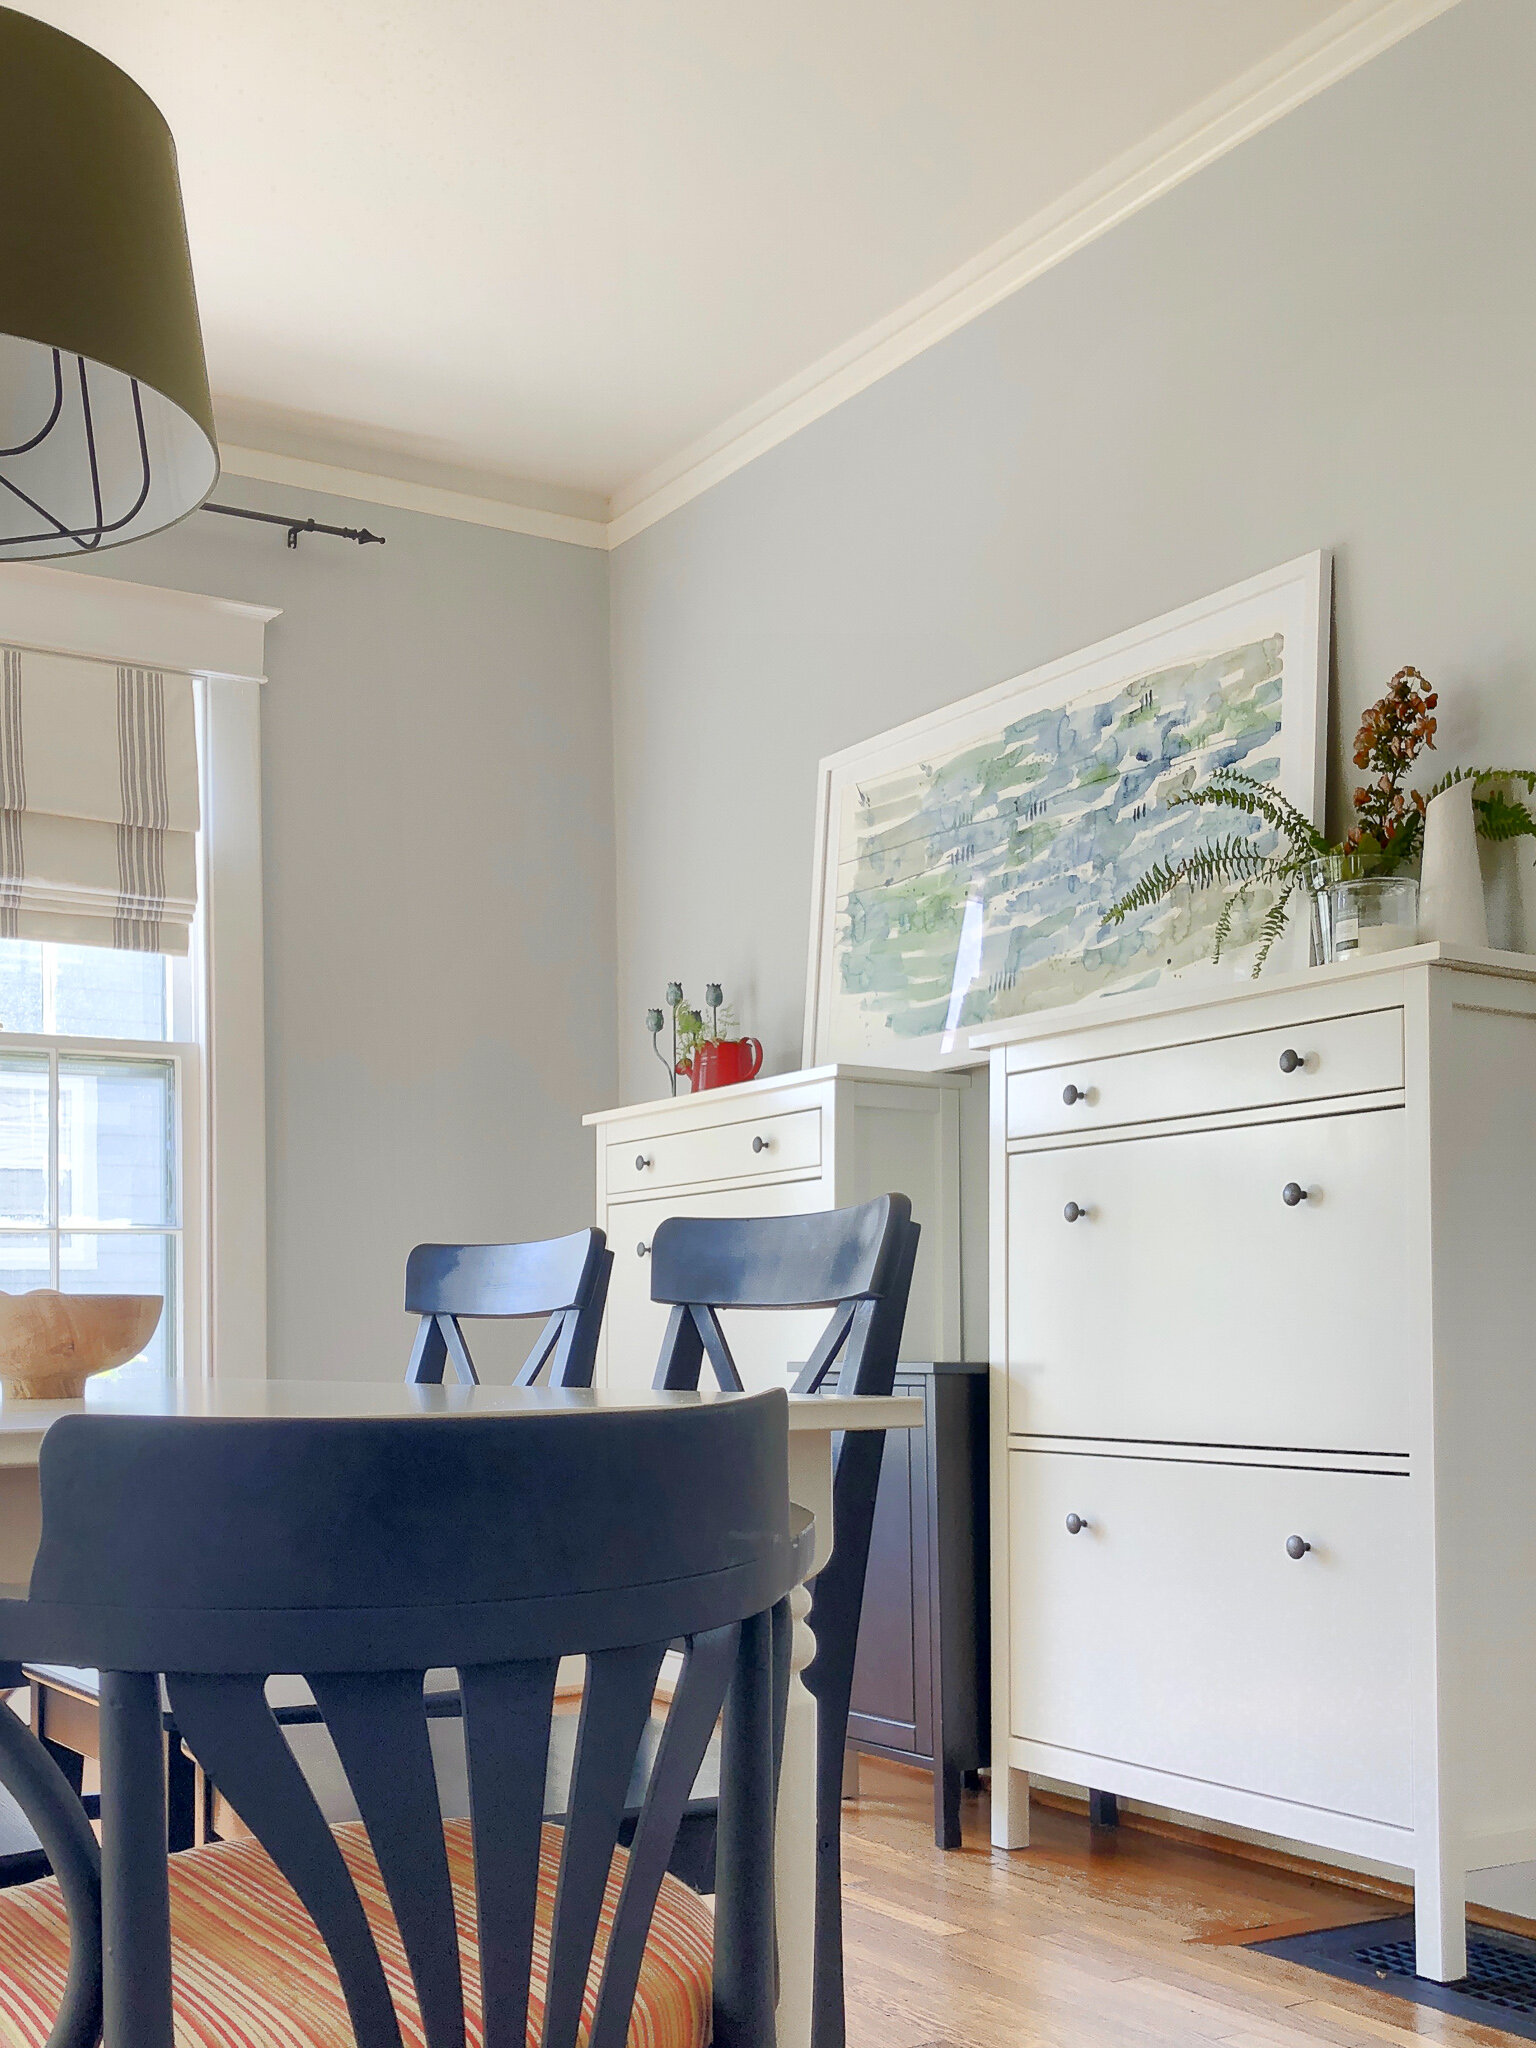 Fall Dining Room - Historic Home Tour for Fall - Plus a round-up of DIY decor ideas #seasonaldecor #autumn #falldecor #diningroom #naturaldecor #artworkforyourhome